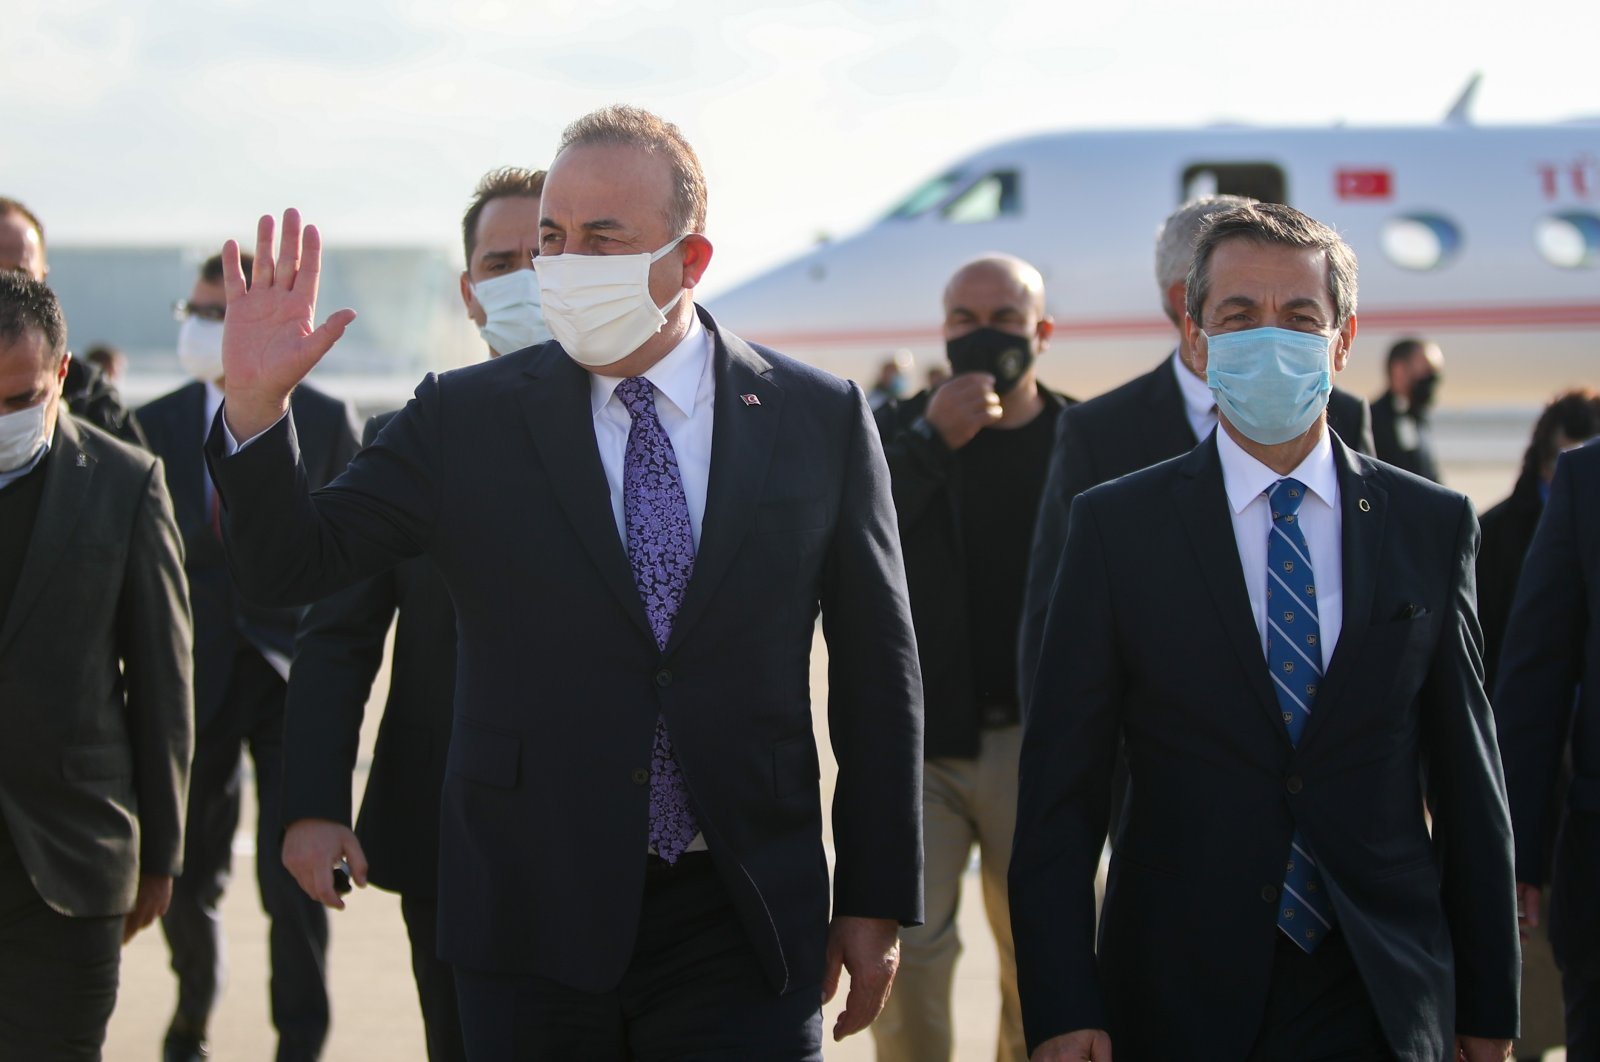 Foreign Minister Mevlüt Çavuşoğlu is welcomed by his Turkish Cypriot counterpart Tahsin Ertuğruloğlu after landing in Ercan Airport in Lefkoşa (Nicosia), Feb.1, 2021. (AA)